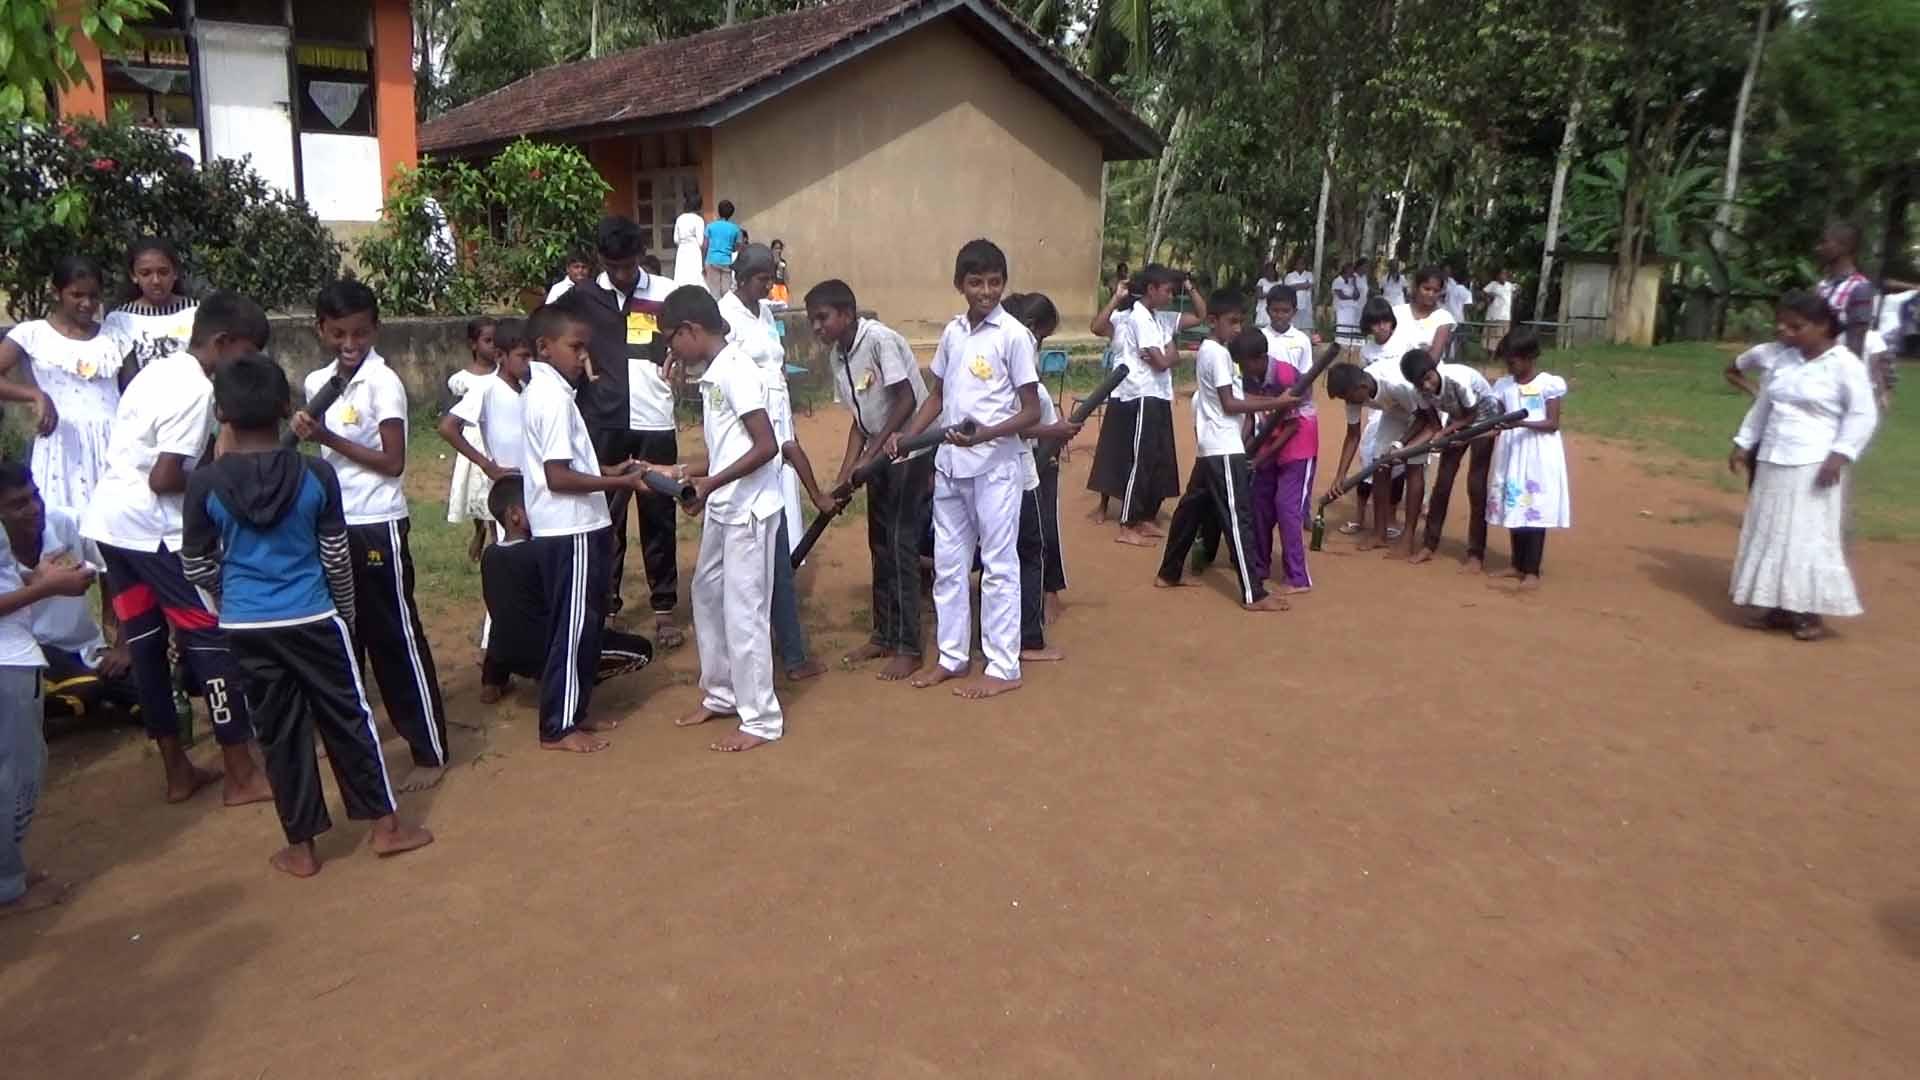 Sati Pasala Mindfulness Camp at Meethirigala Kanishta Vidyalaya-mindful games (19)